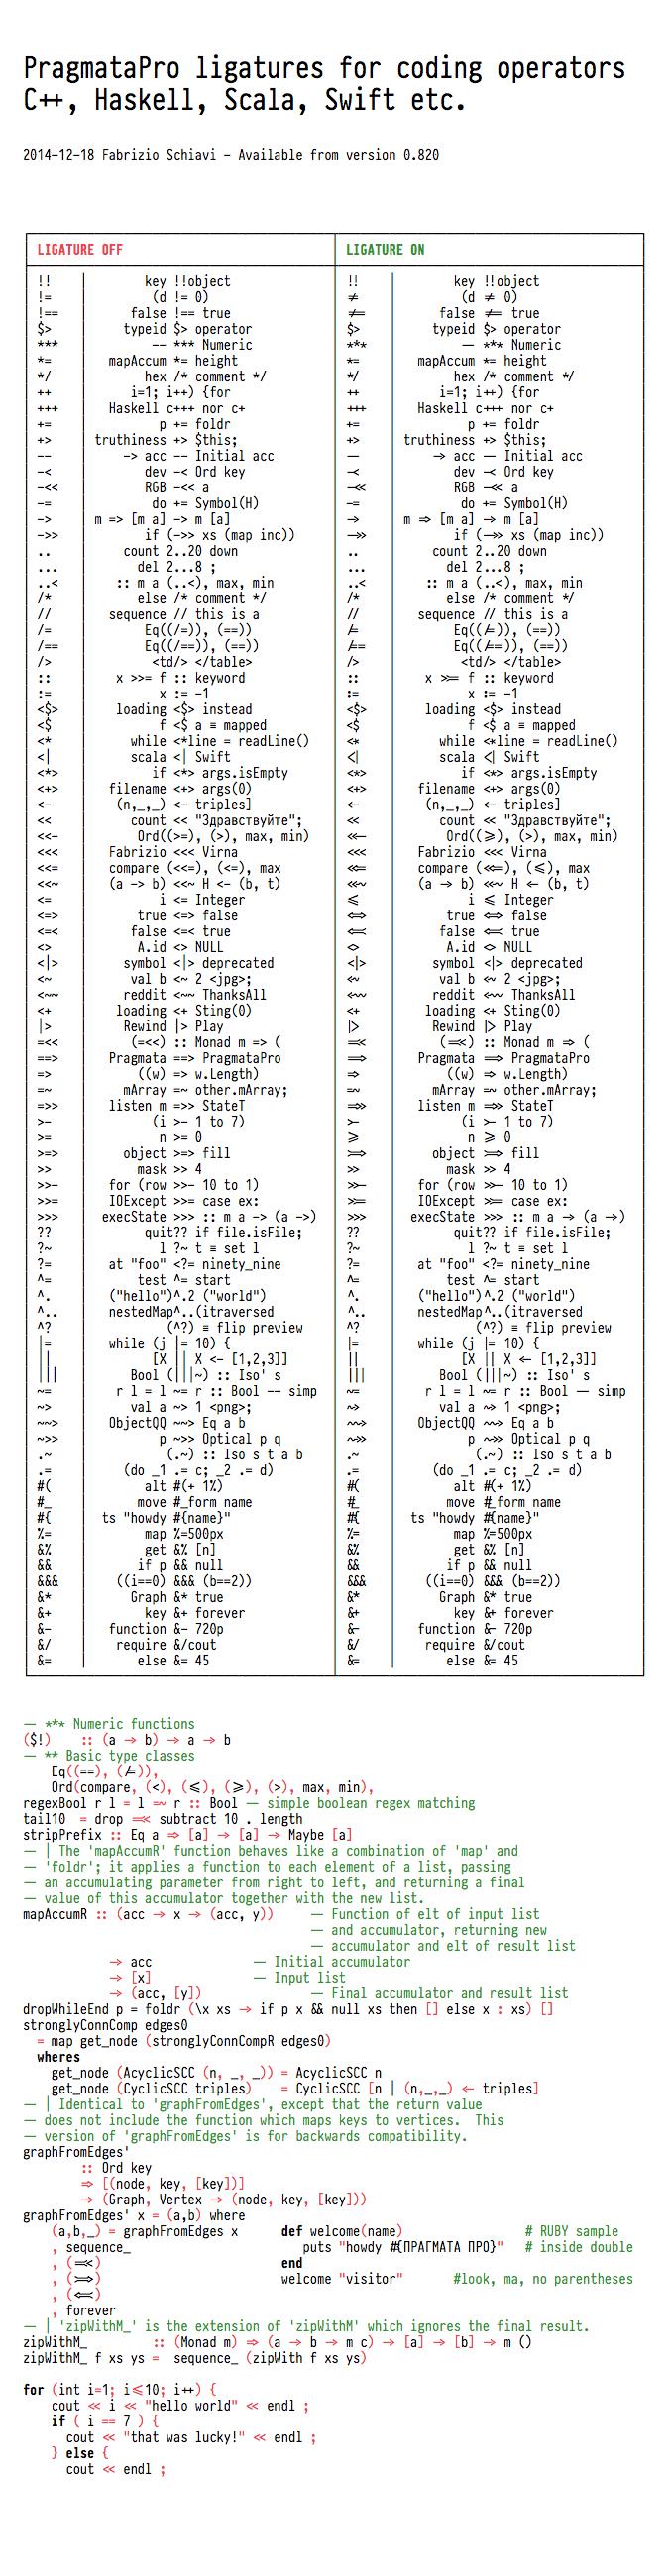 PragmataPro Haskell ligatures list